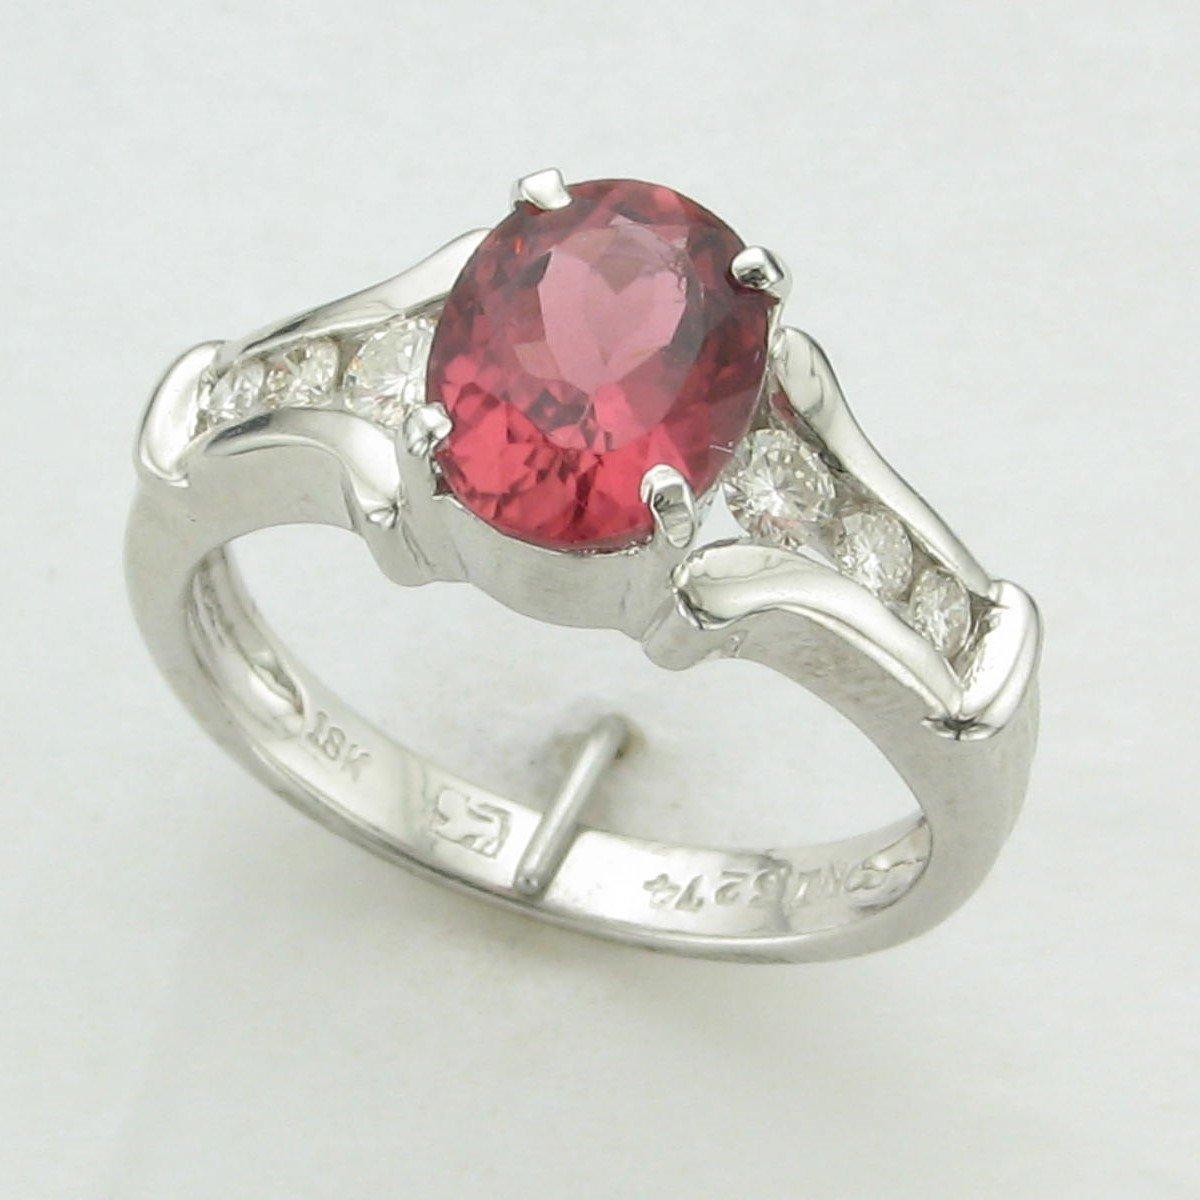 18K White Gold Designer Pink Tourmaline and Diamond Ring